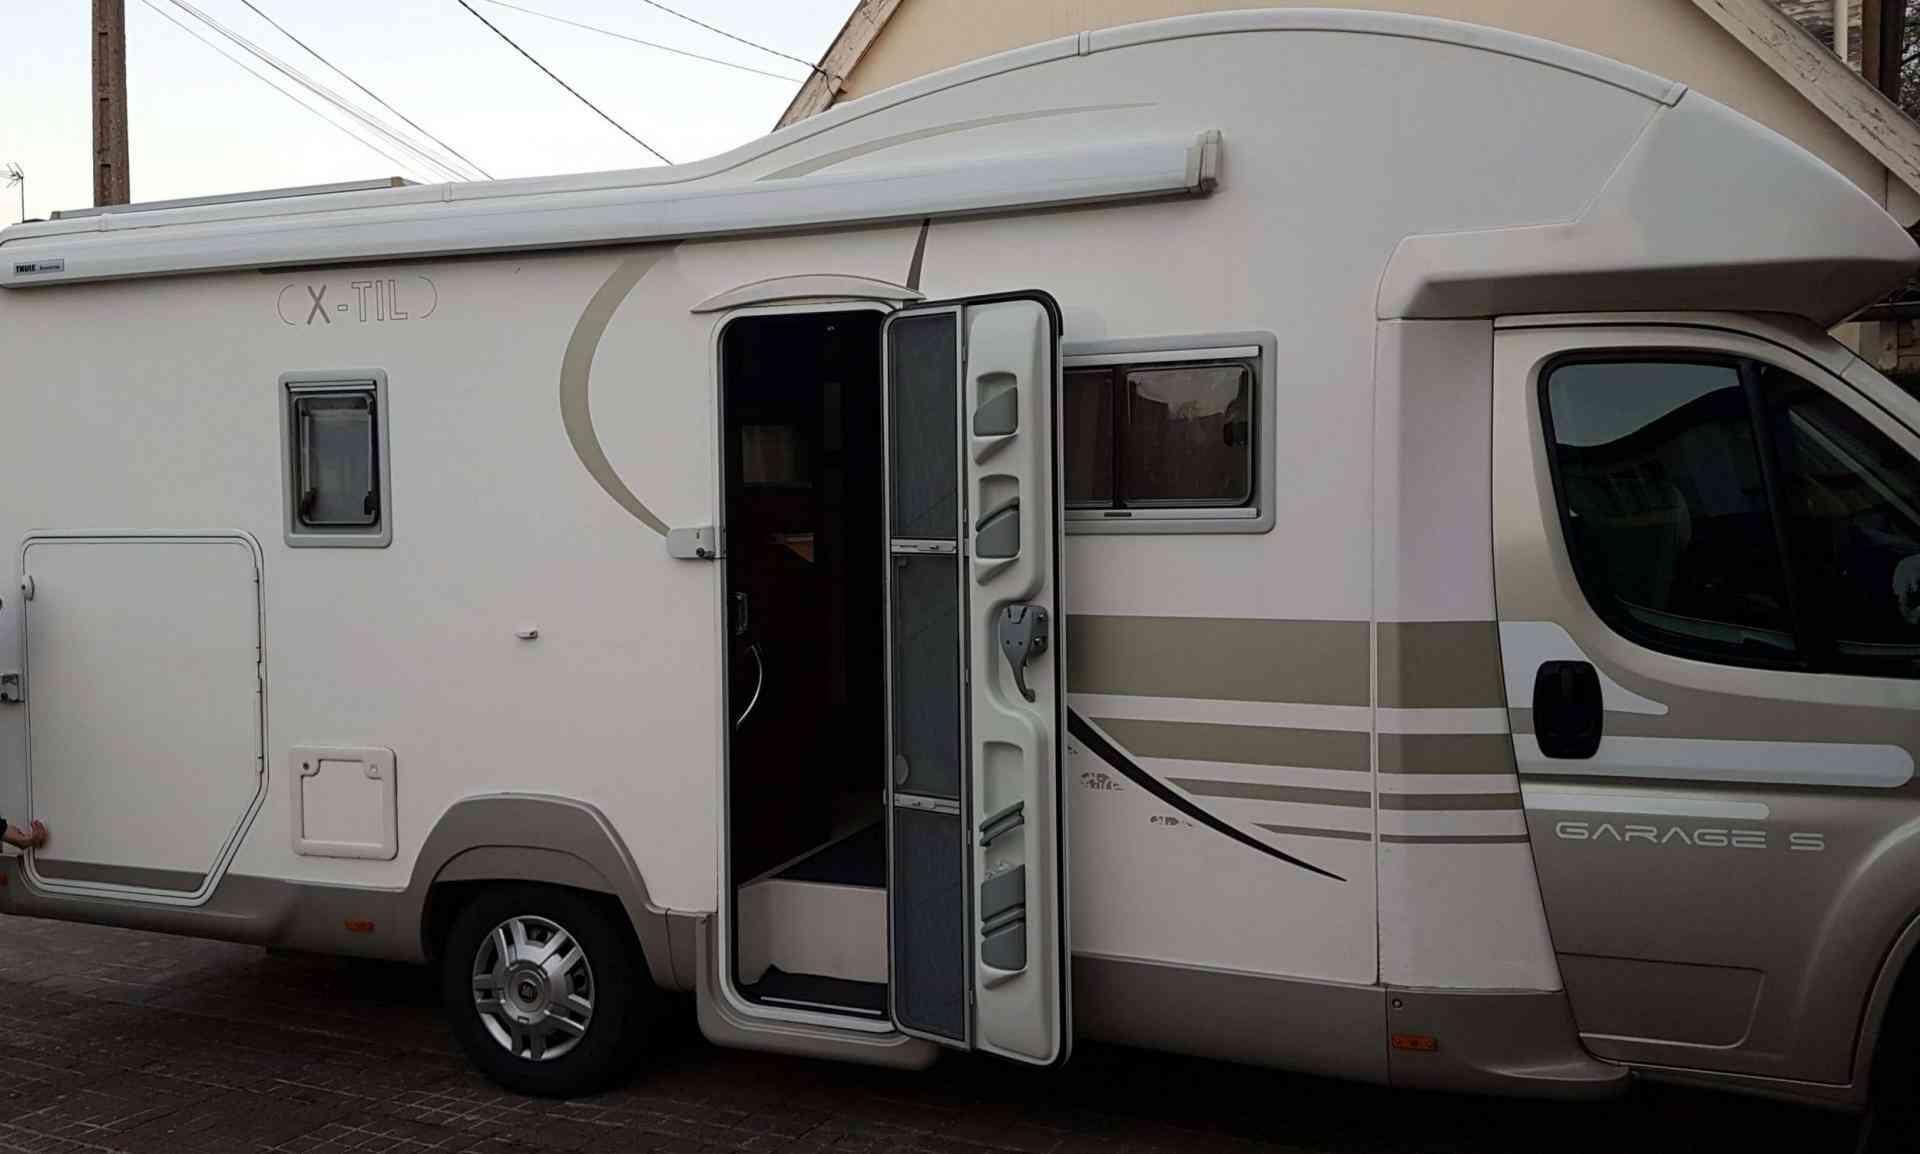 camping-car CI X-TIL